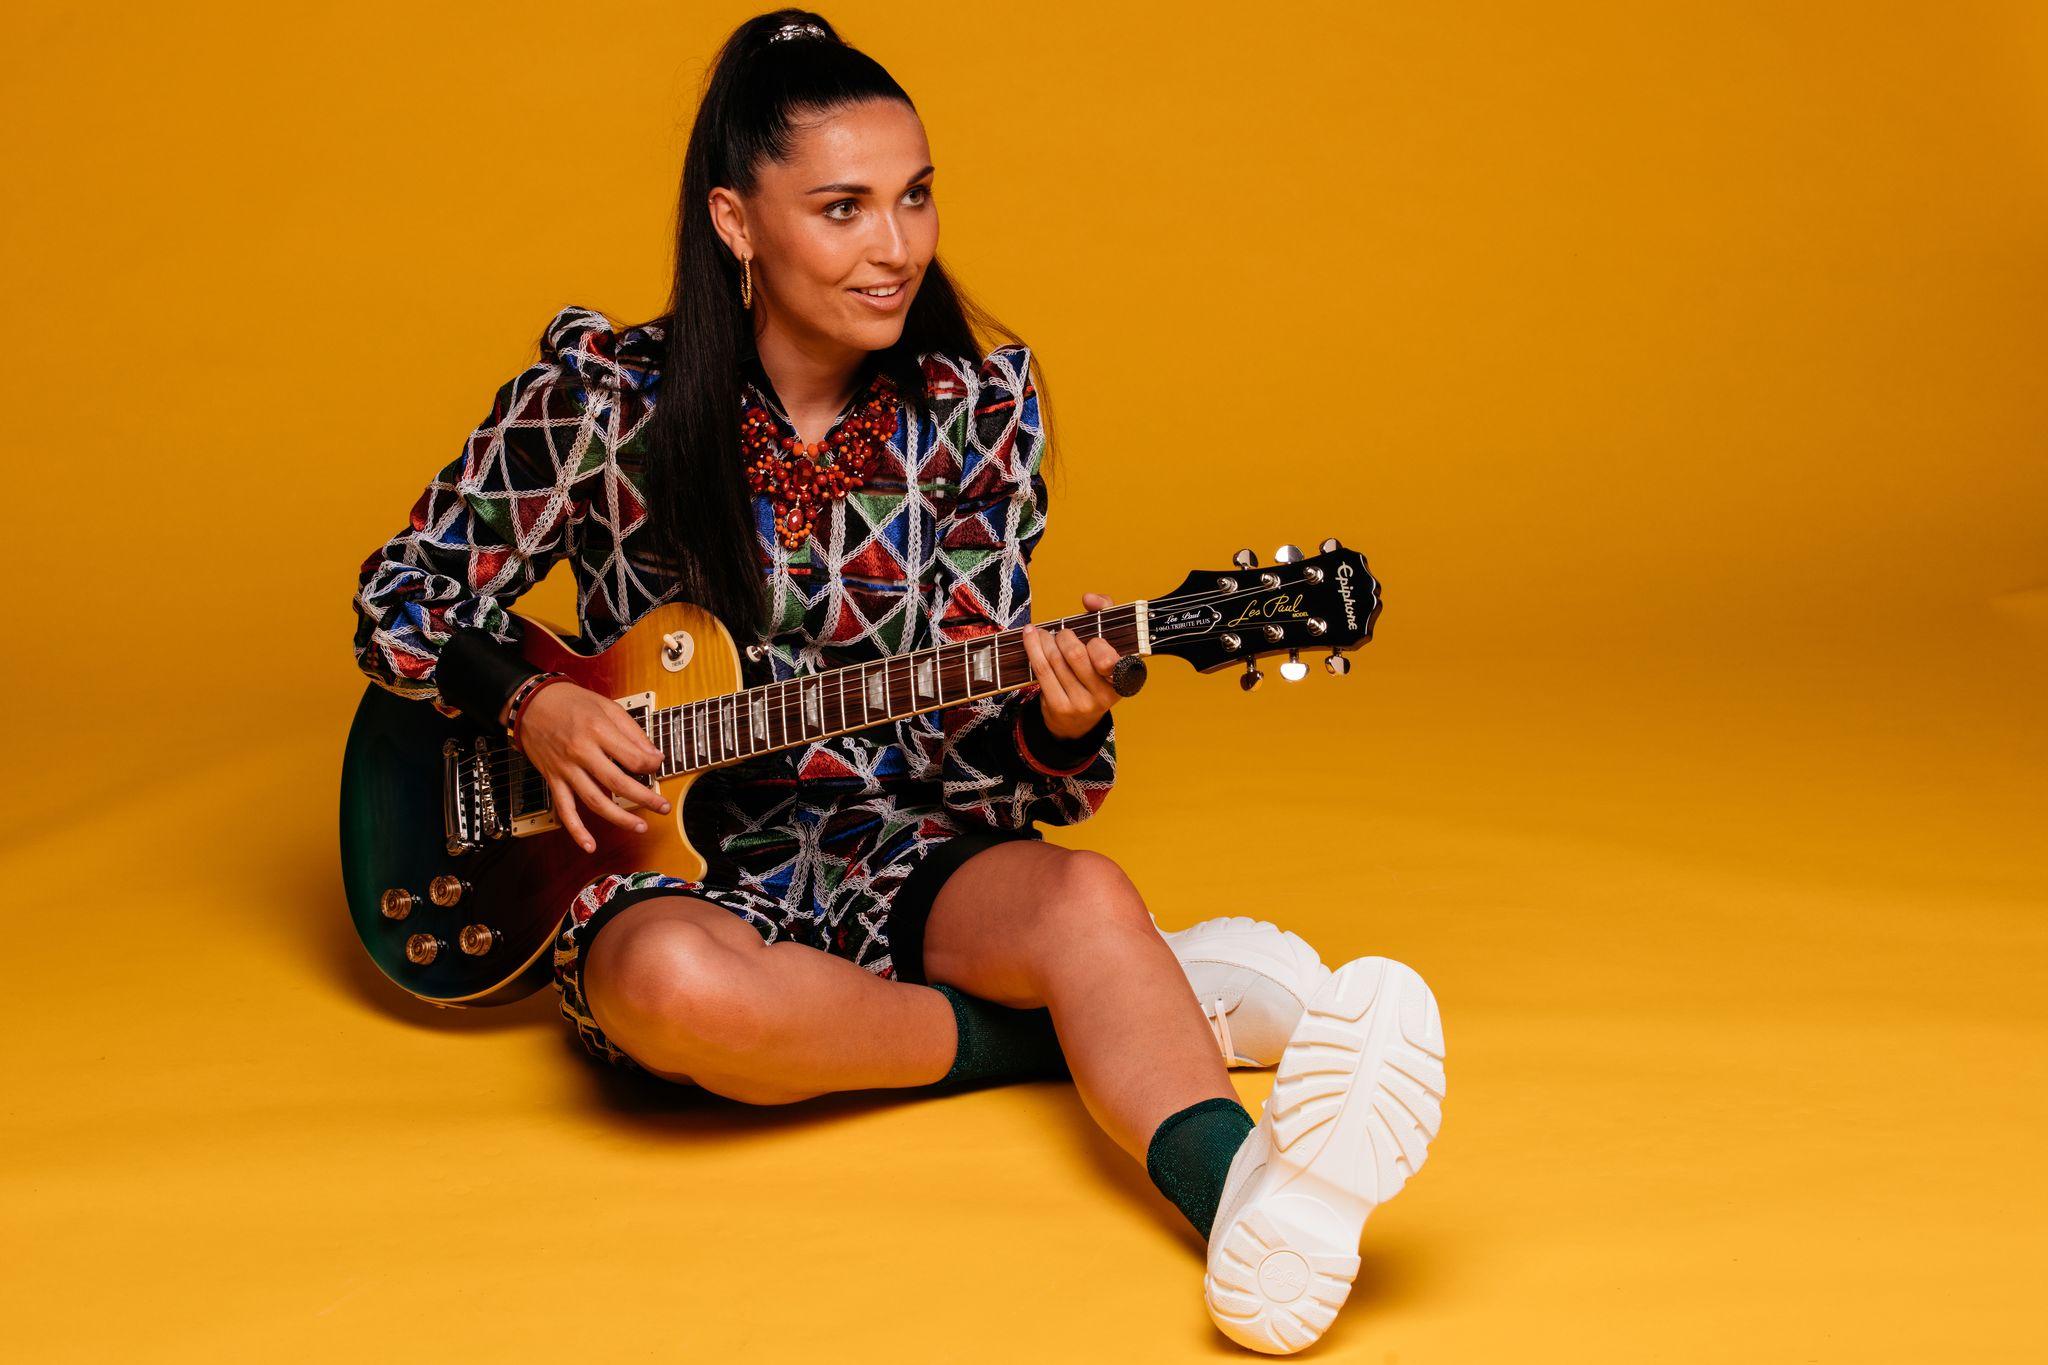 Camille Esteban - Chico (Clip Officiel)